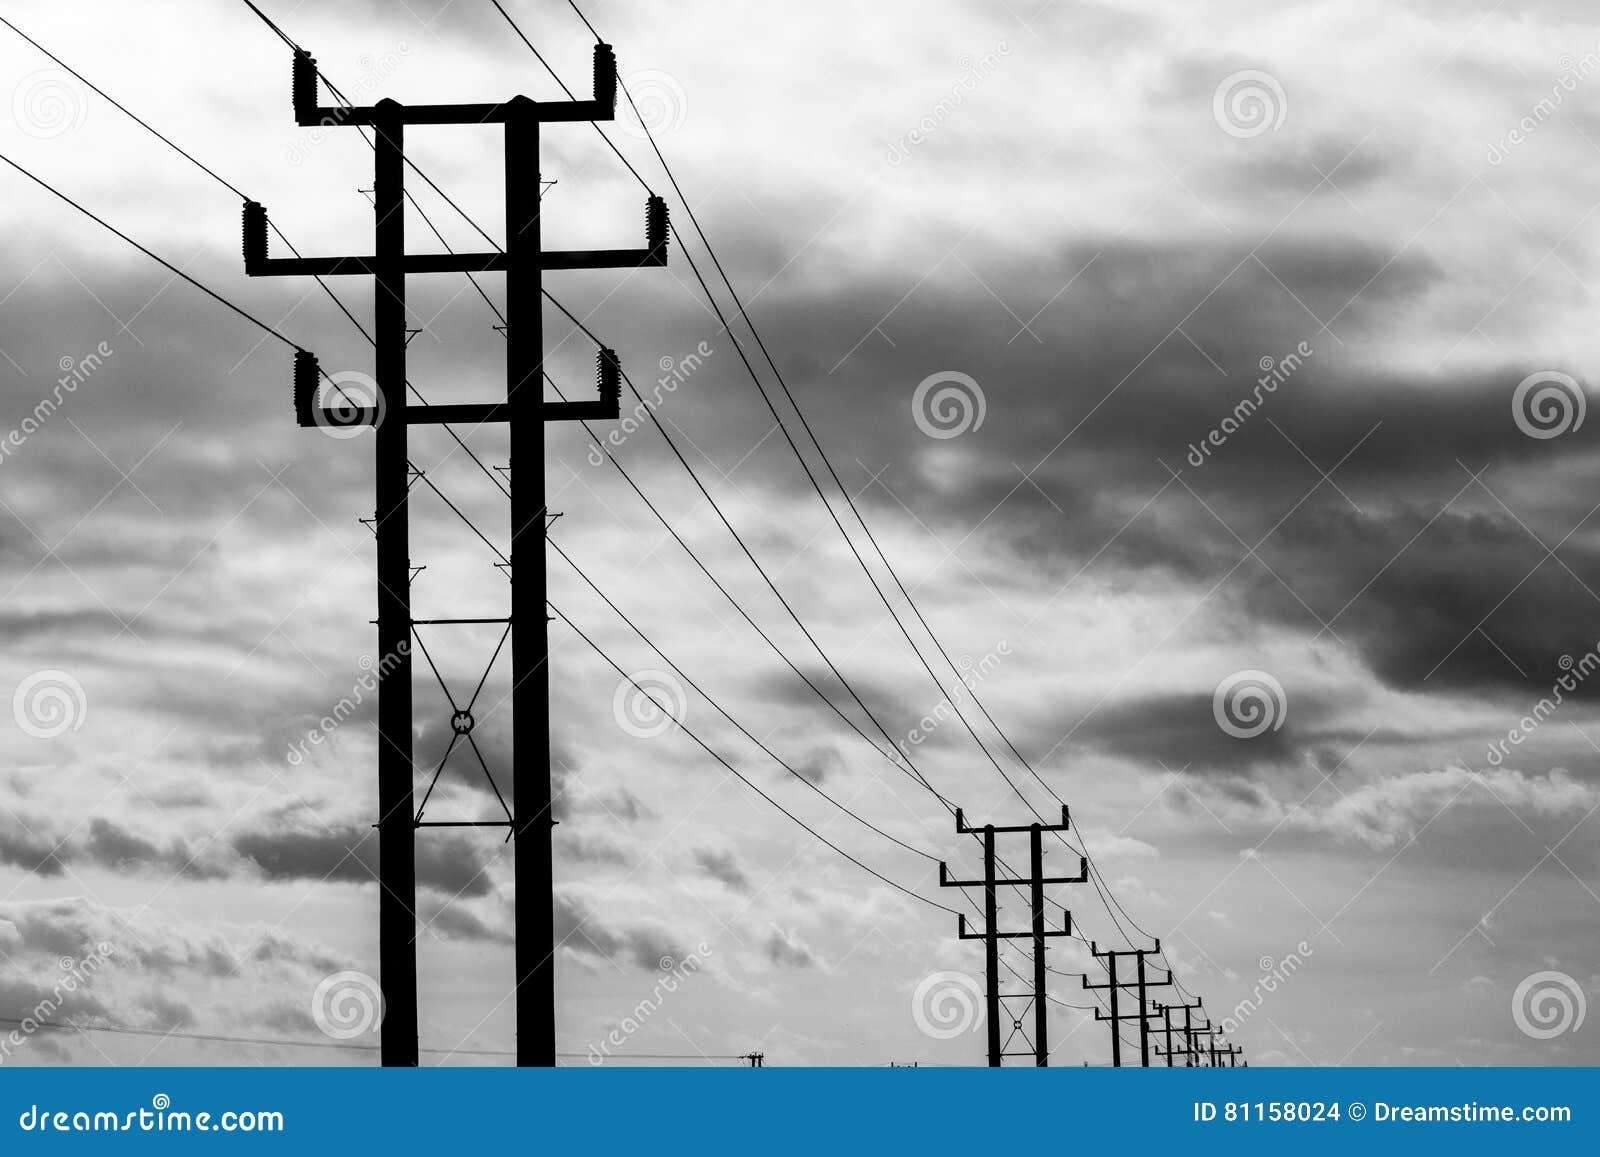 Telegraph poles. stock photo. Image of daylight, pole - 81158024